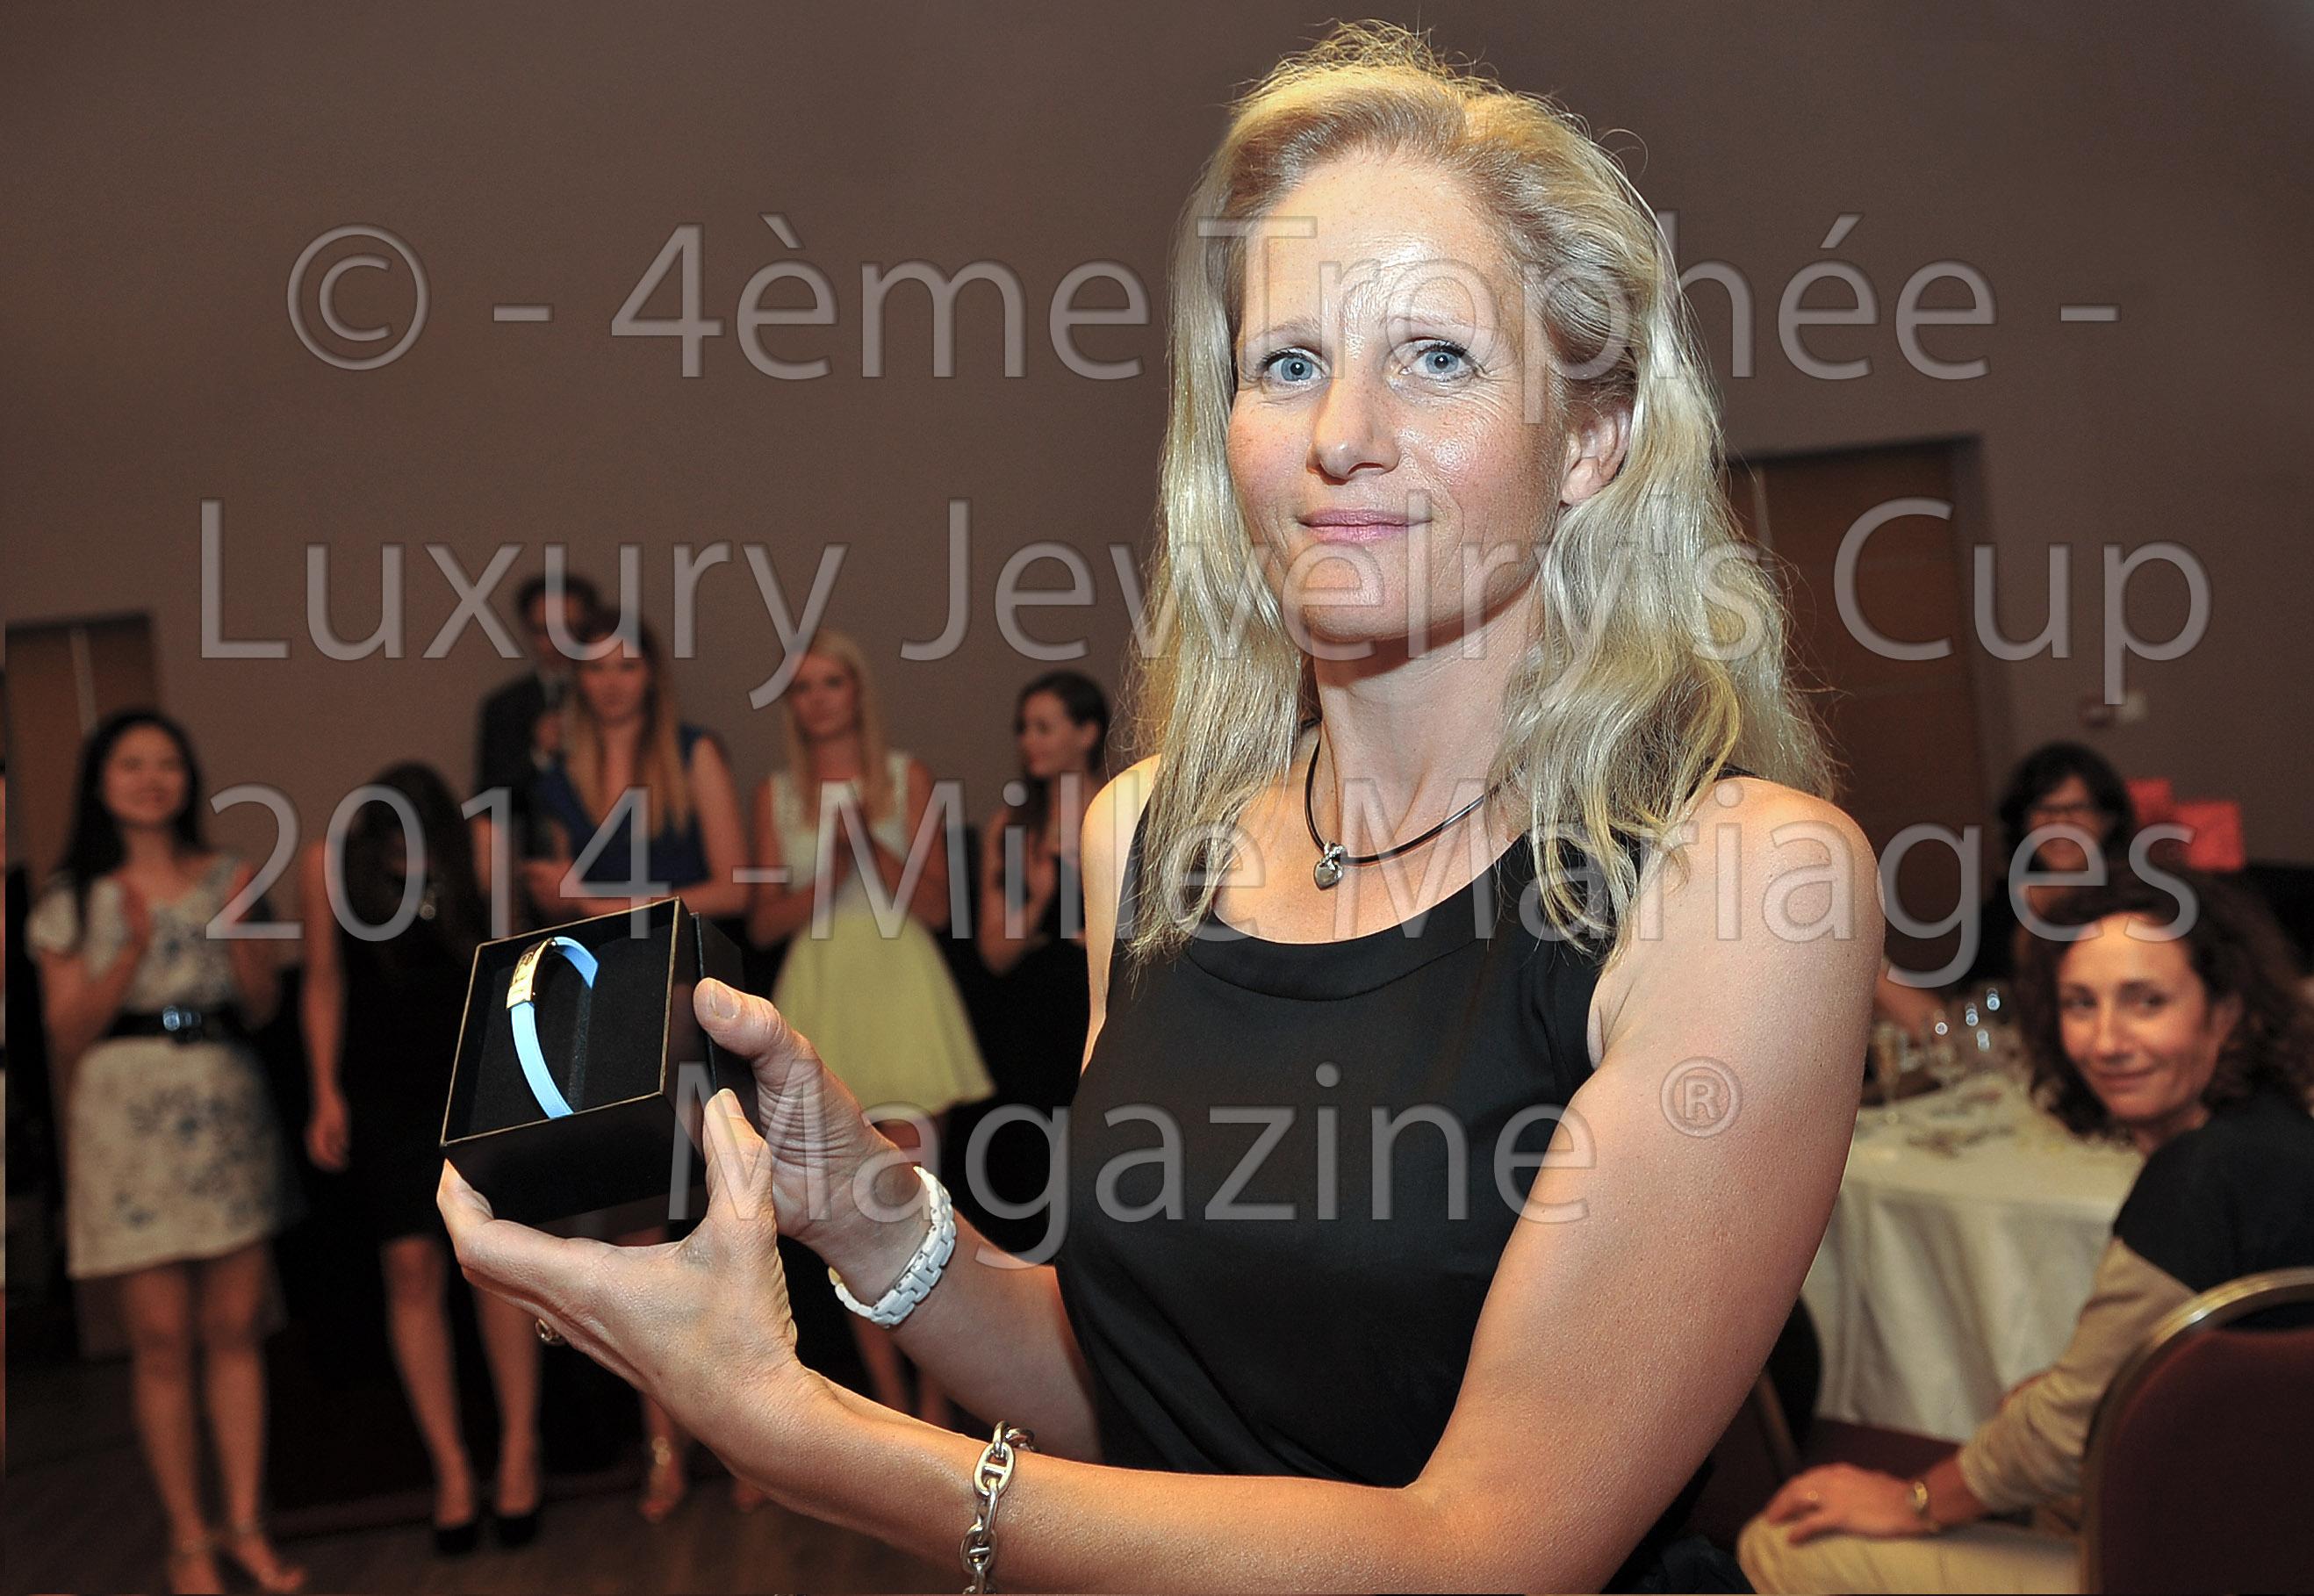 4e Luxury Jewelry's Cup 2014 (28 & 29 JUIN)20140630_0644 copie